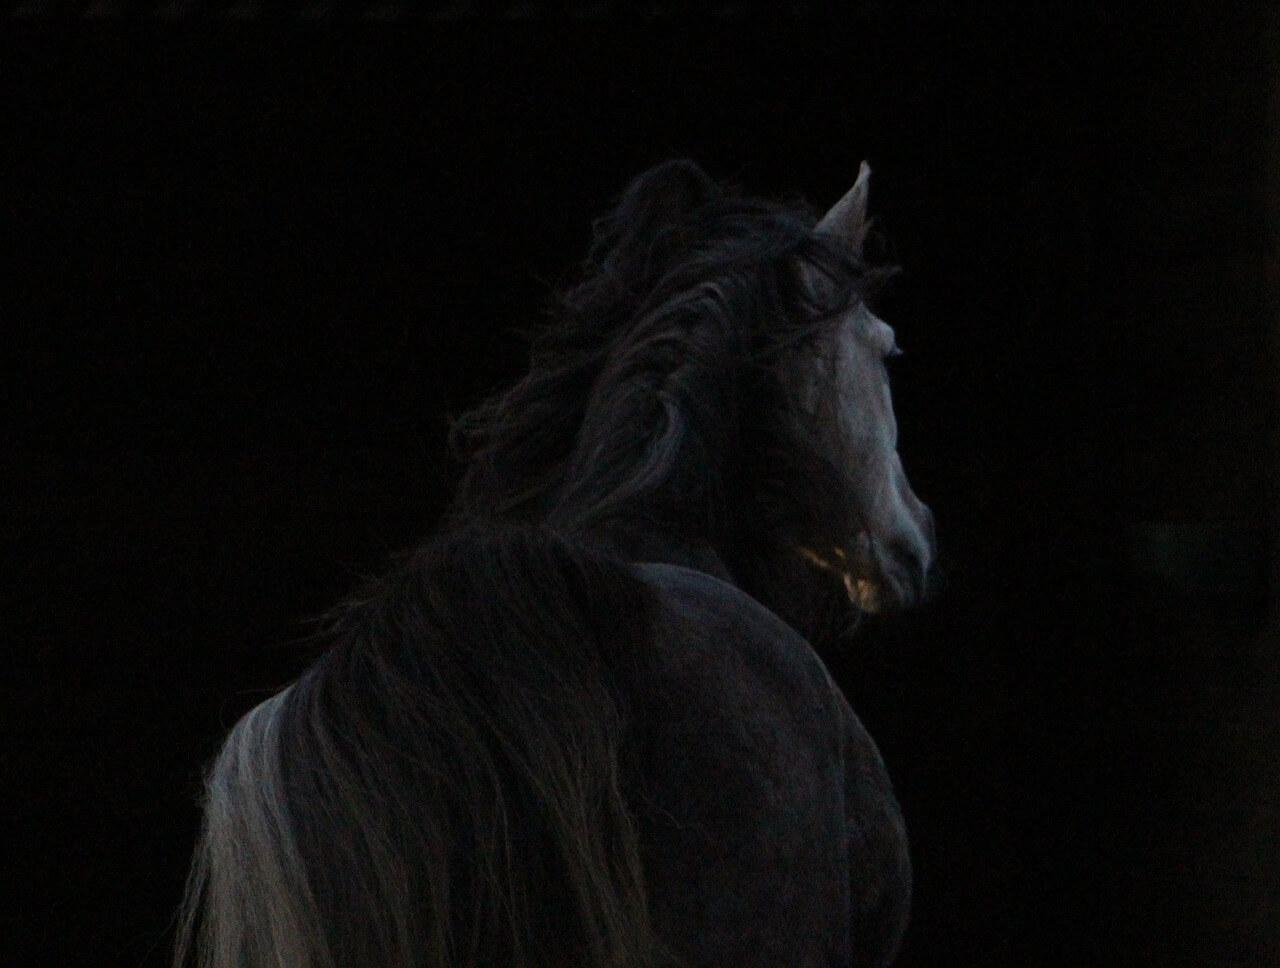 horse-943001_1280